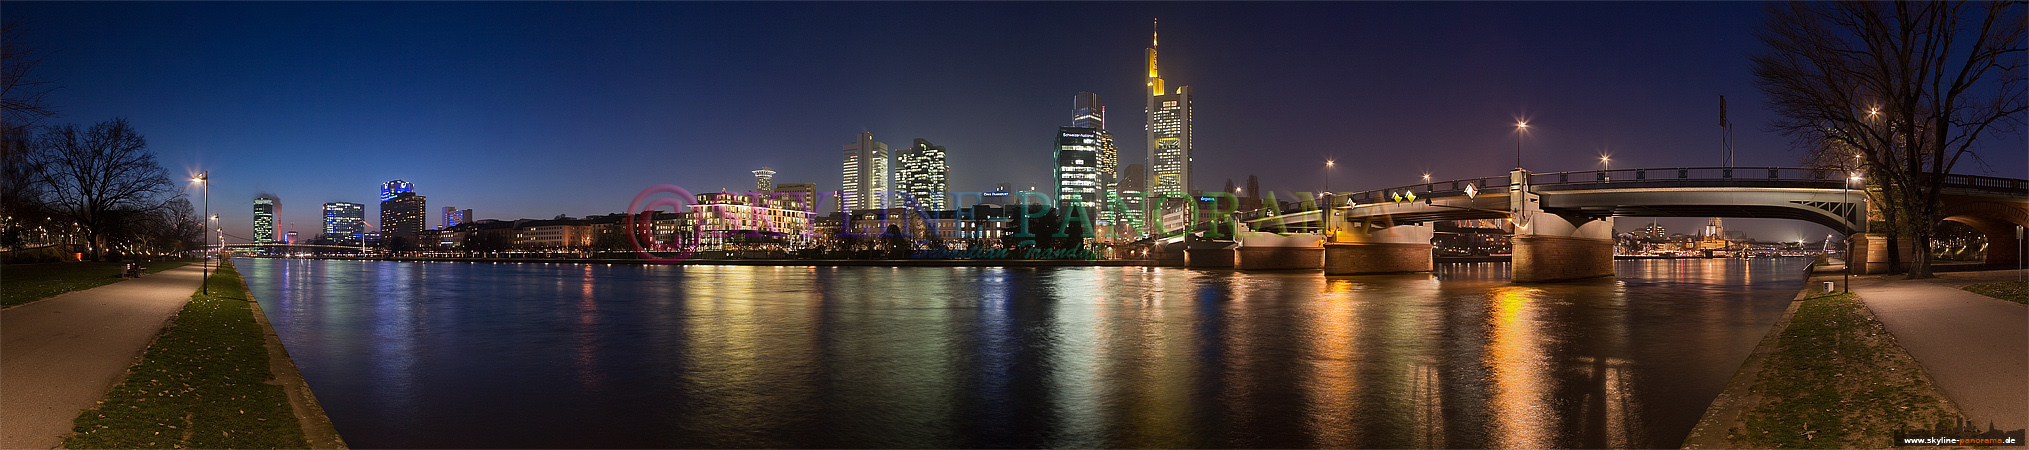 Untermainbrücke Frankfurt